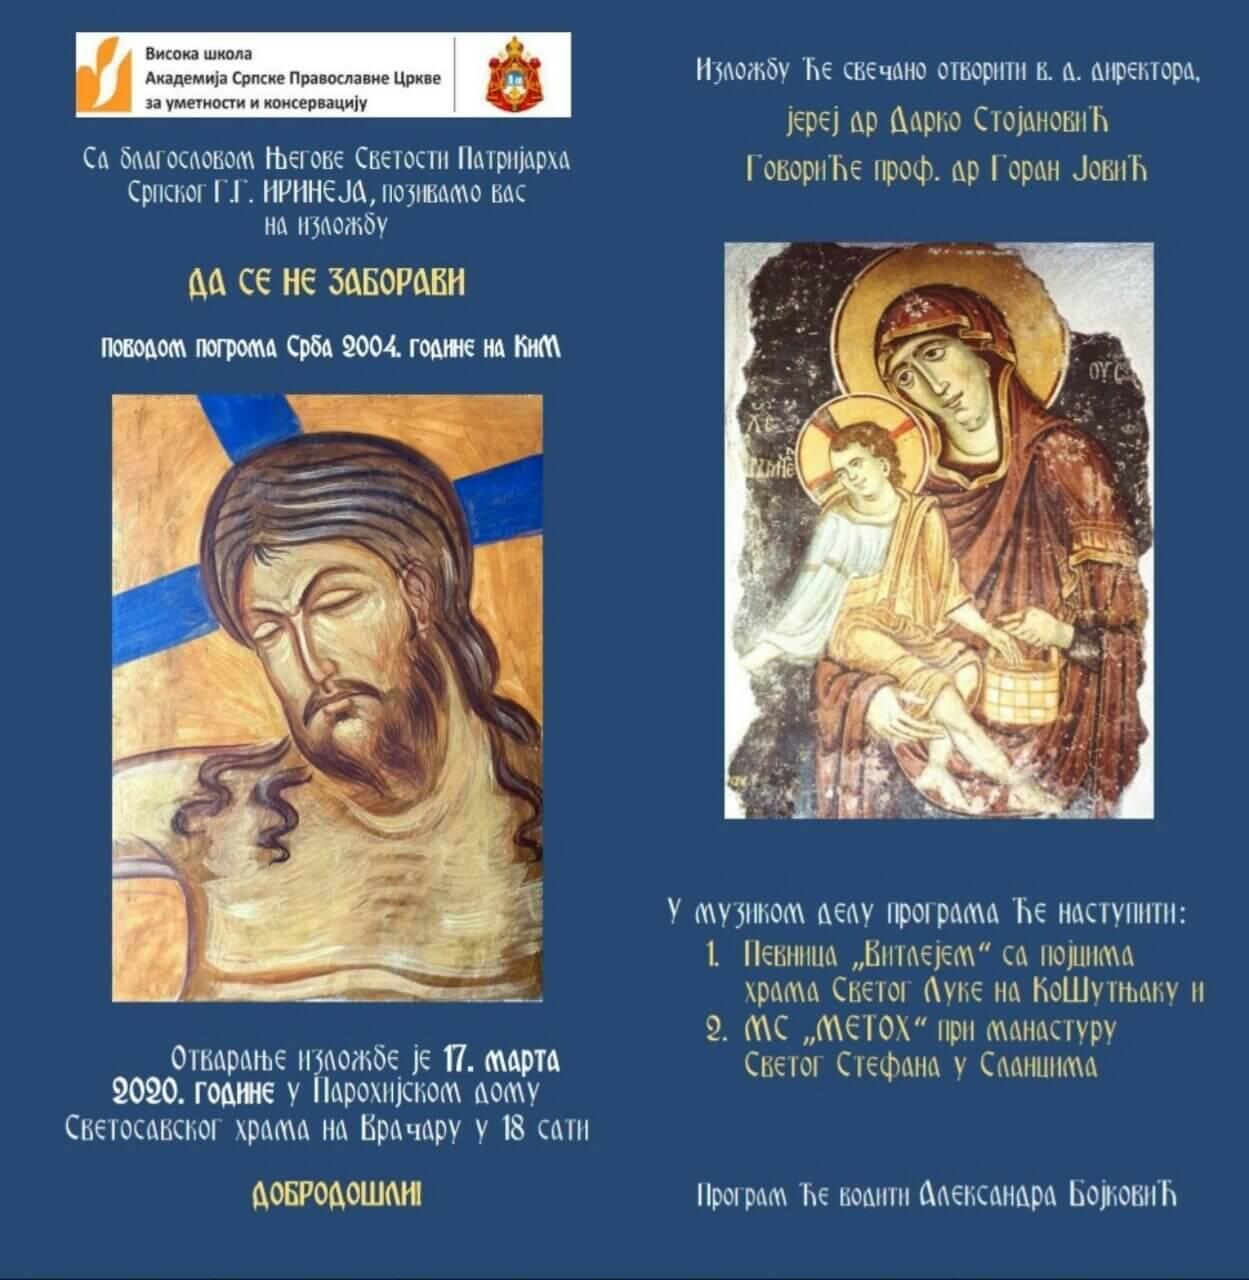 Ana Maljevic - Pravslavne ikone po narudžbini - Katalog izložbi 15